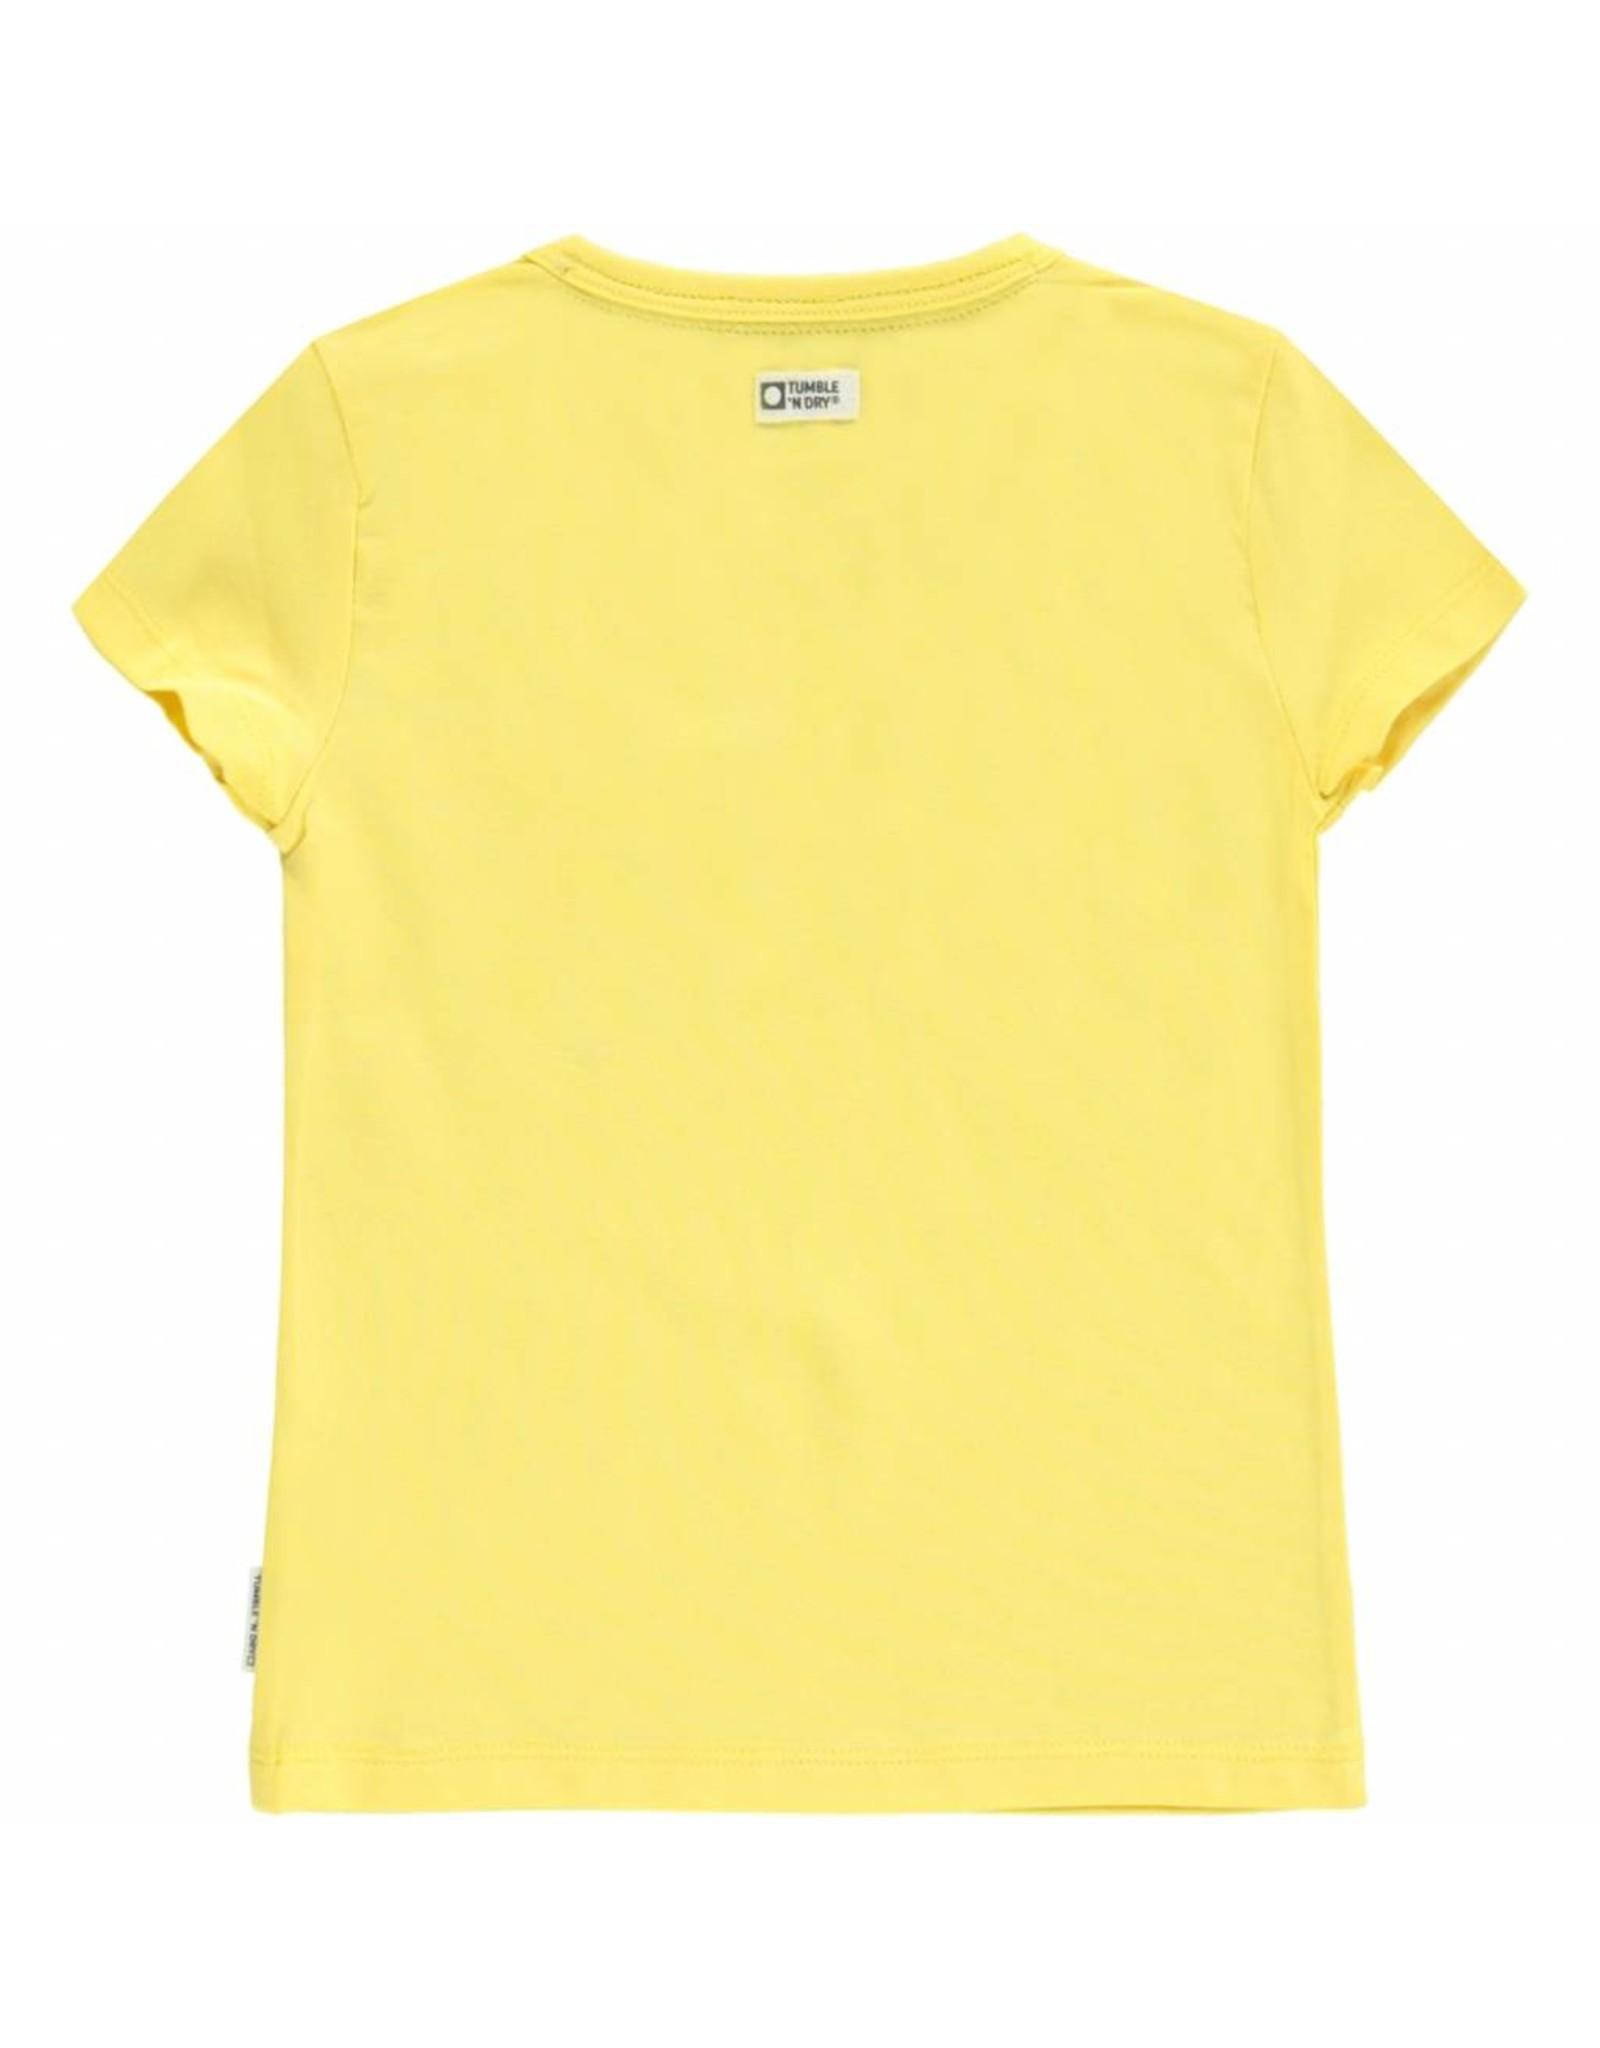 TUMBLE 'N DRY Tumble 'N Dry Girls Lo - Ellores yellow corn